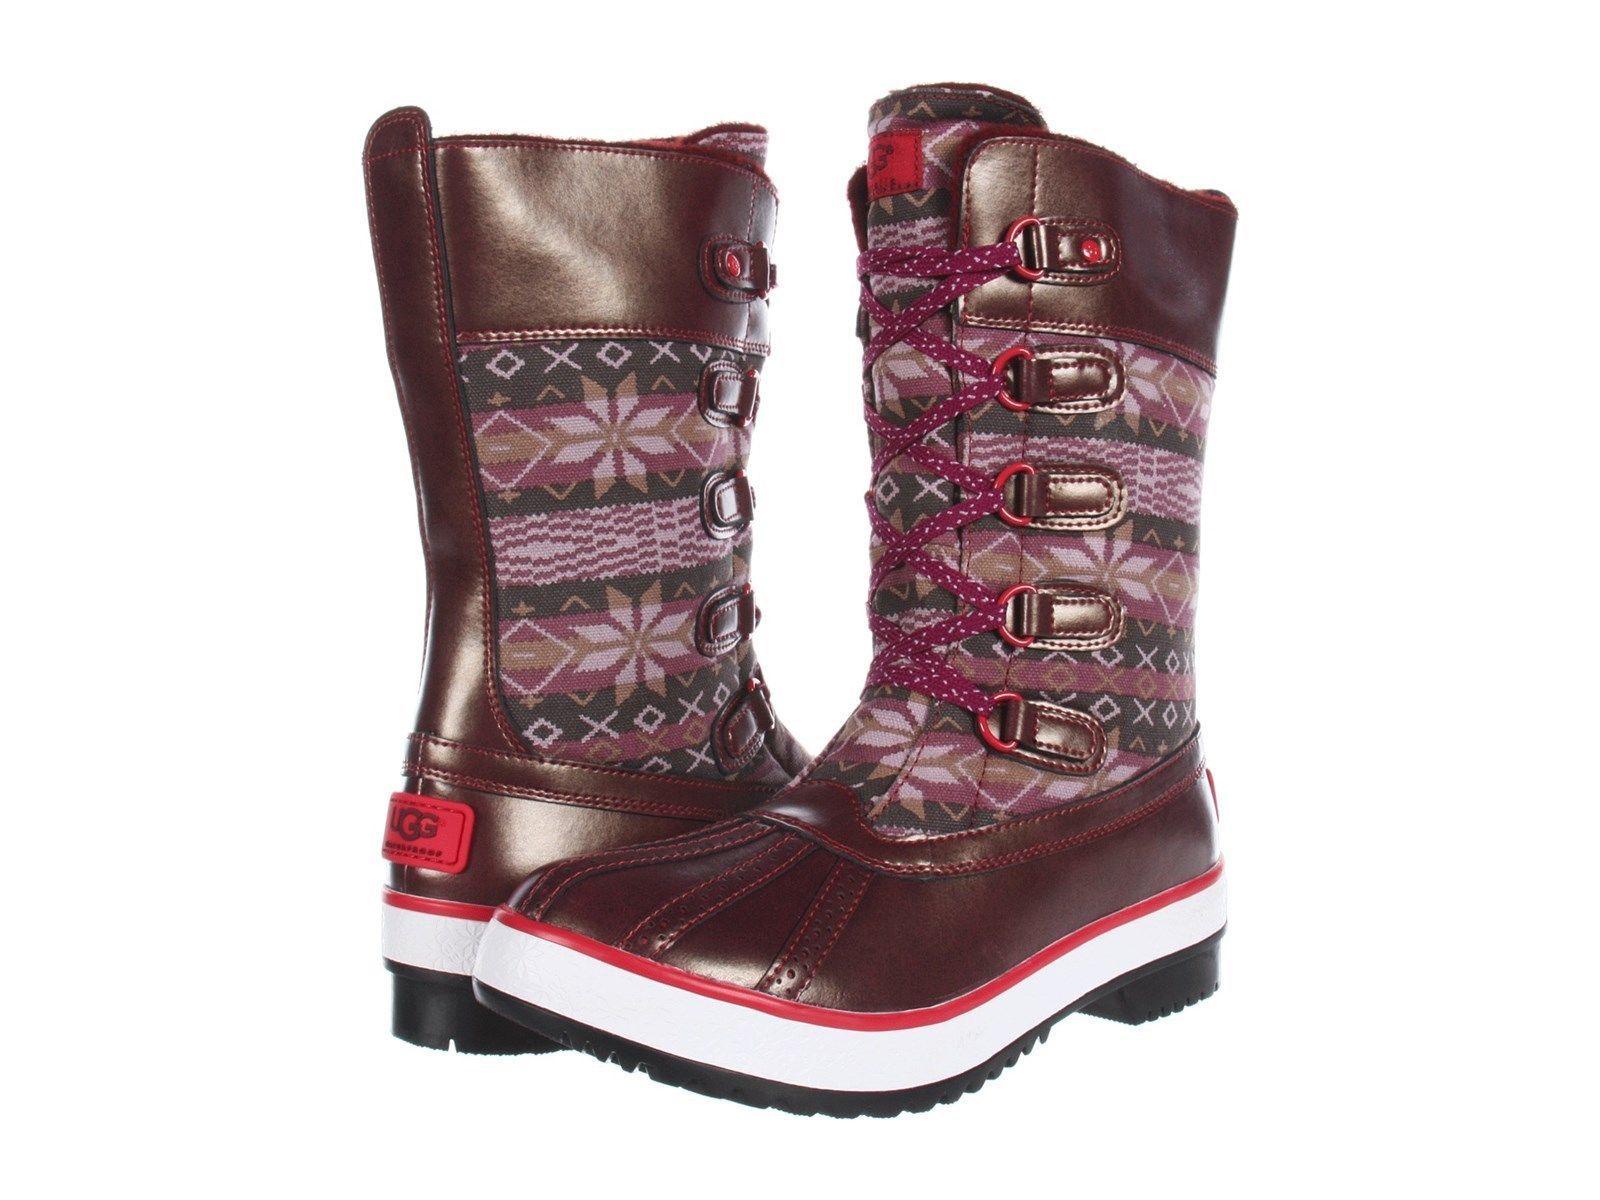 NEW UGG Australia Baroness Lace Up Winter Rain Boots 6